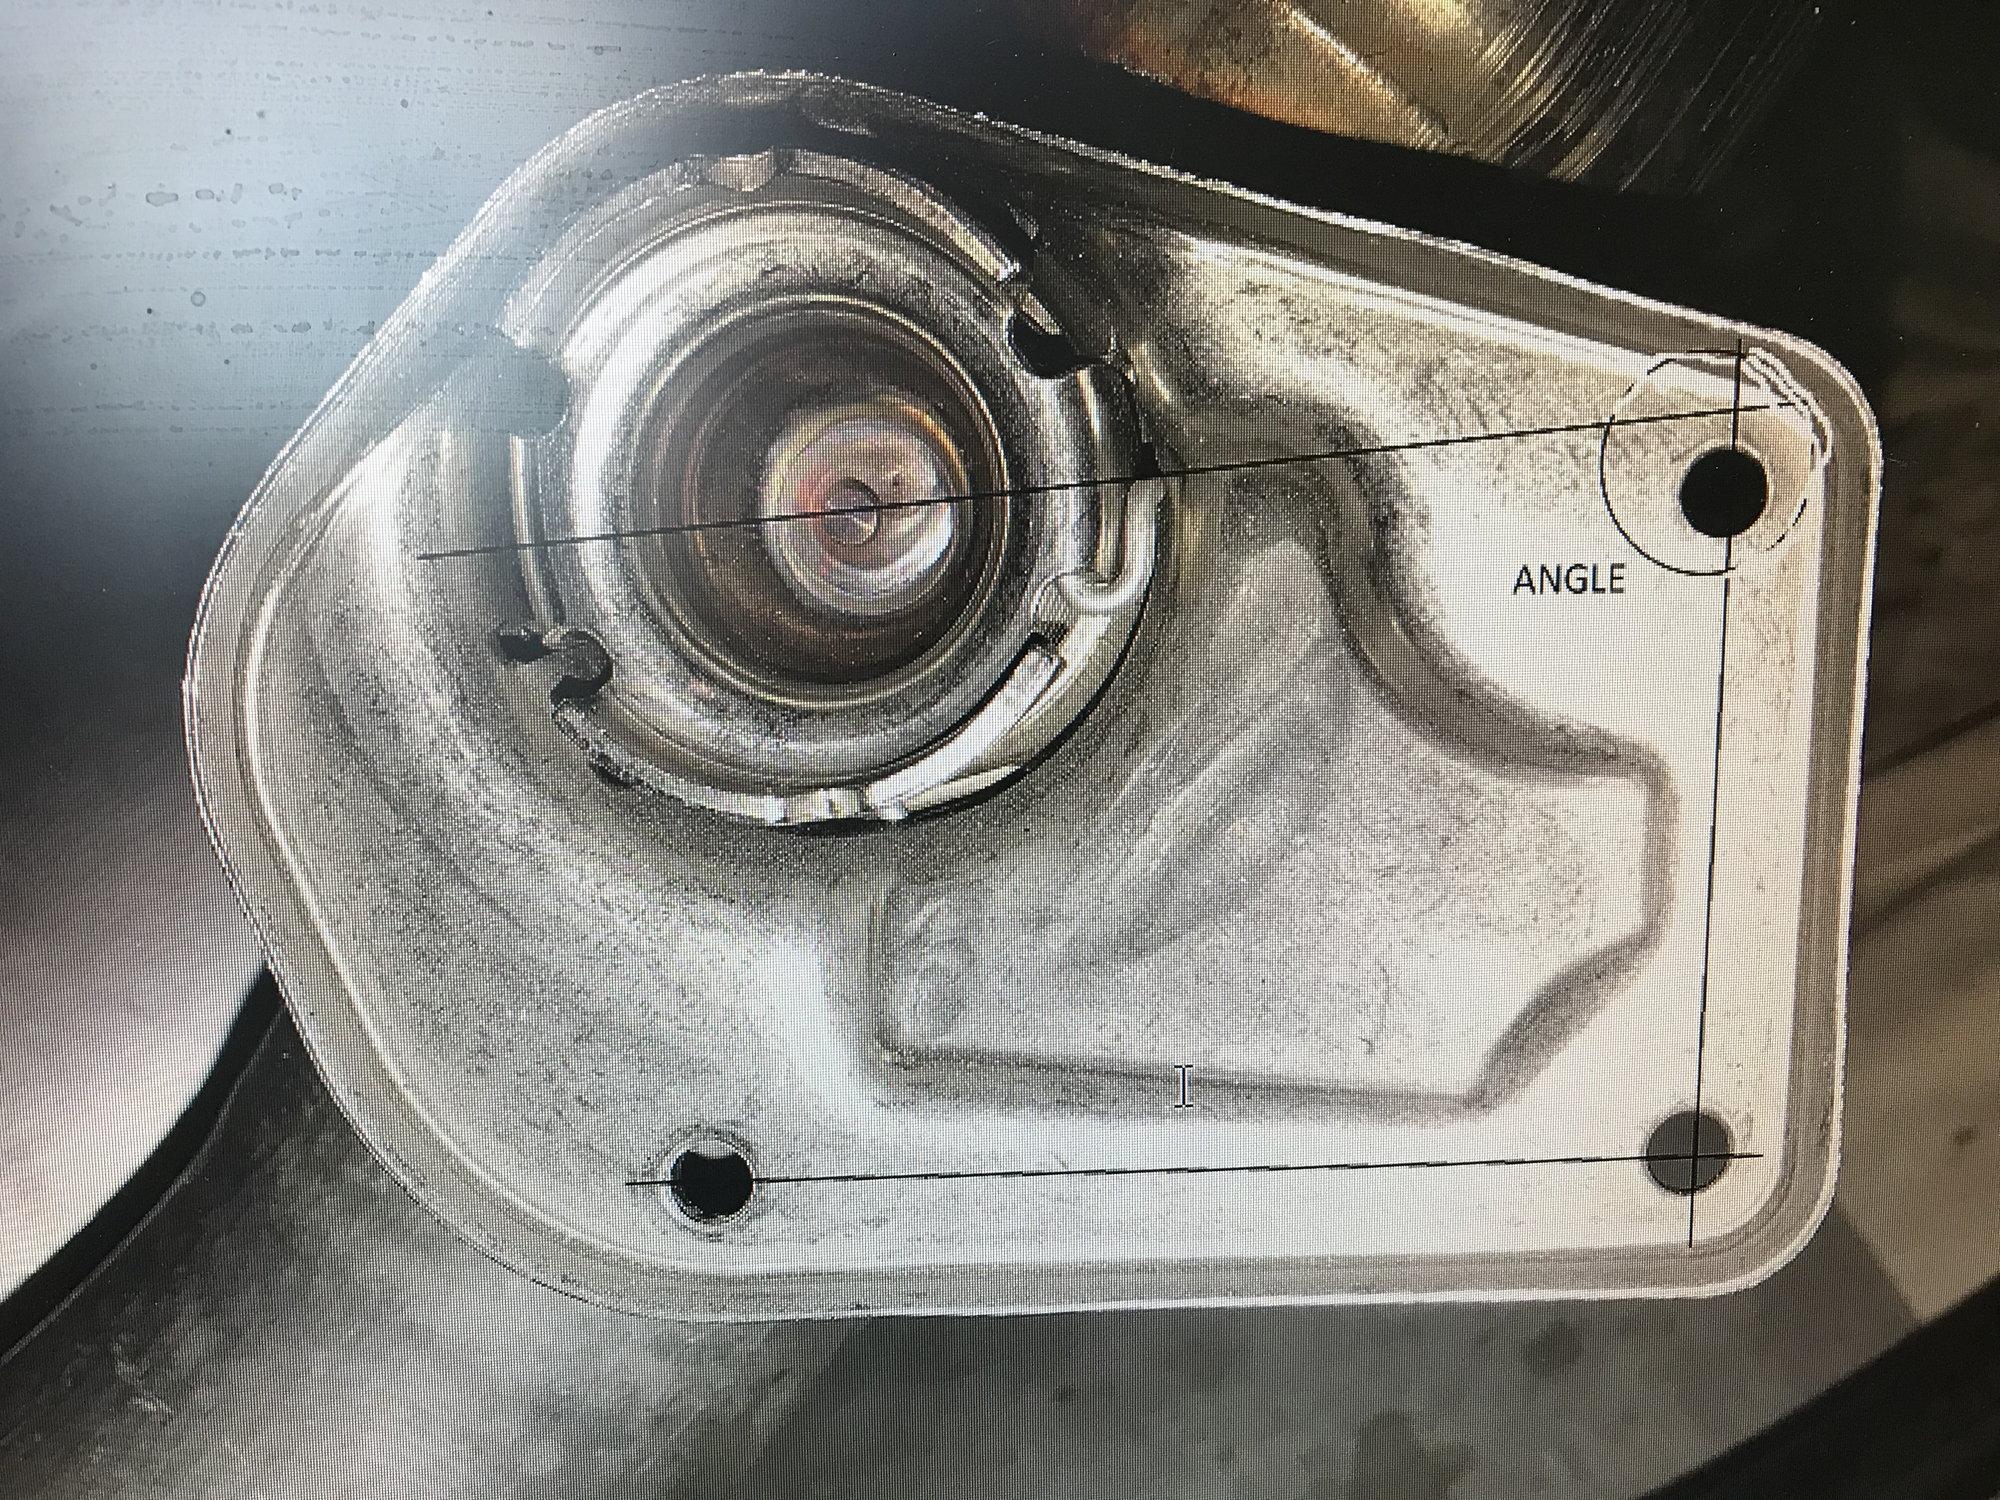 AFM valves relearn alternative after installing new exhaust